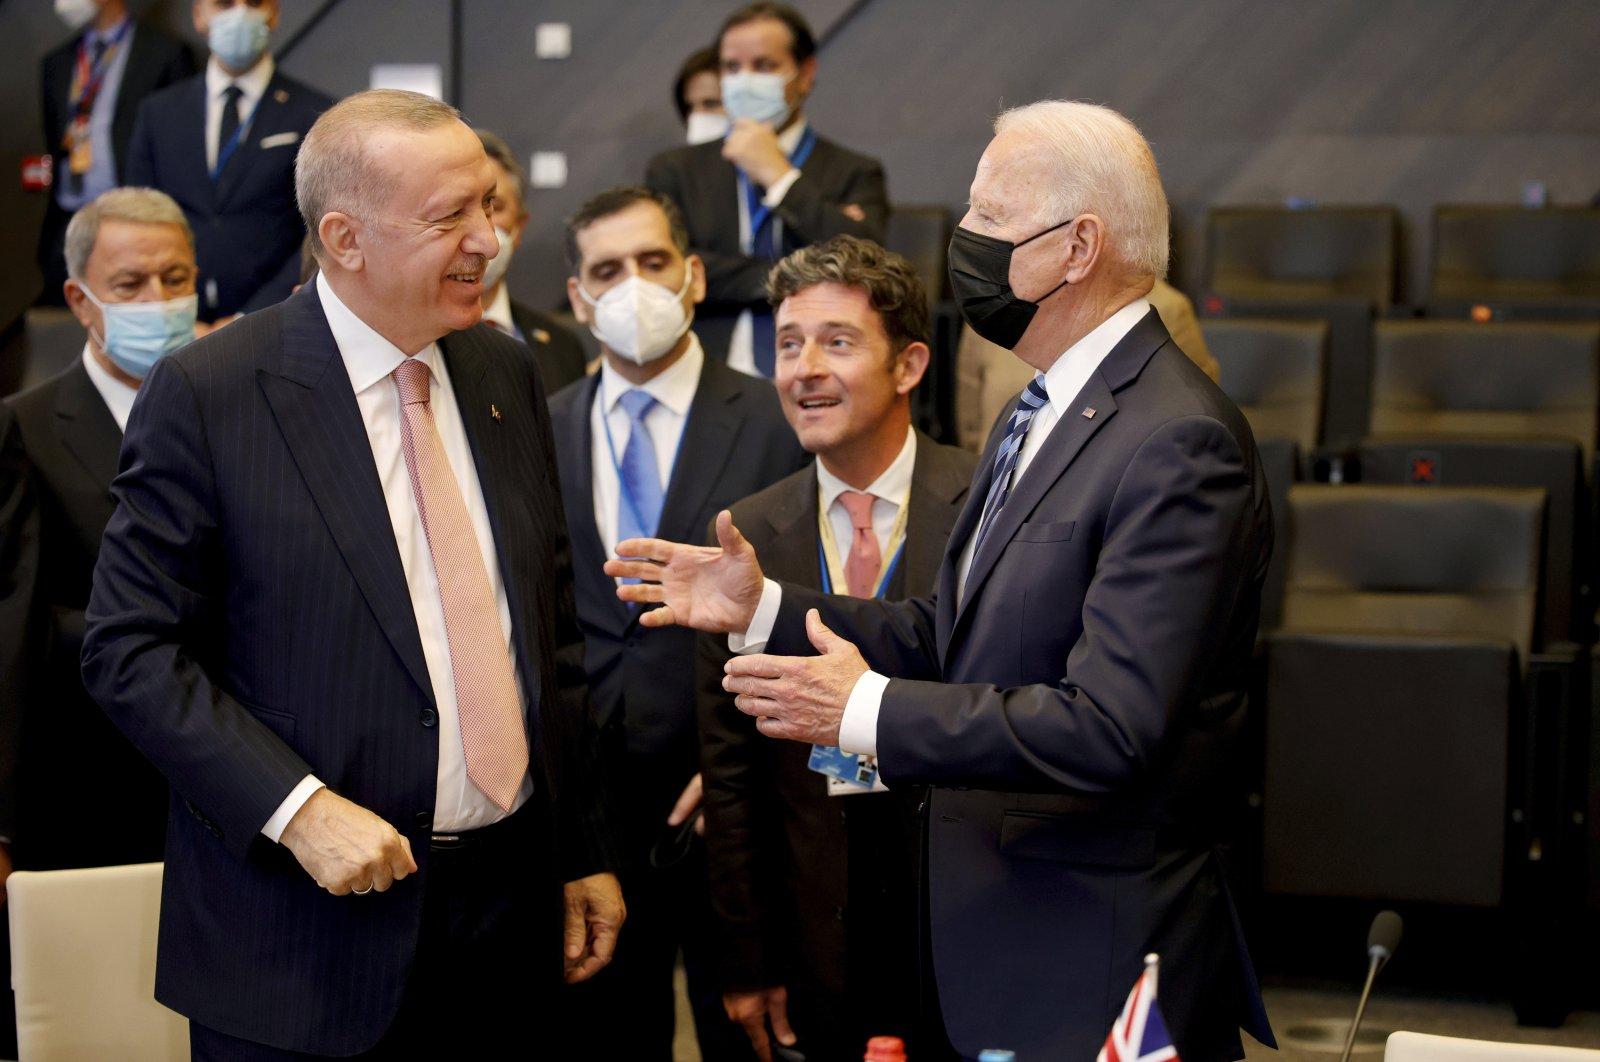 President Recep Tayyip Erdoğan (L) and U.S. President Joe Biden speak during a plenary session at a NATO summit in Brussels, Belgium, June 14, 2021. (AP Photo)